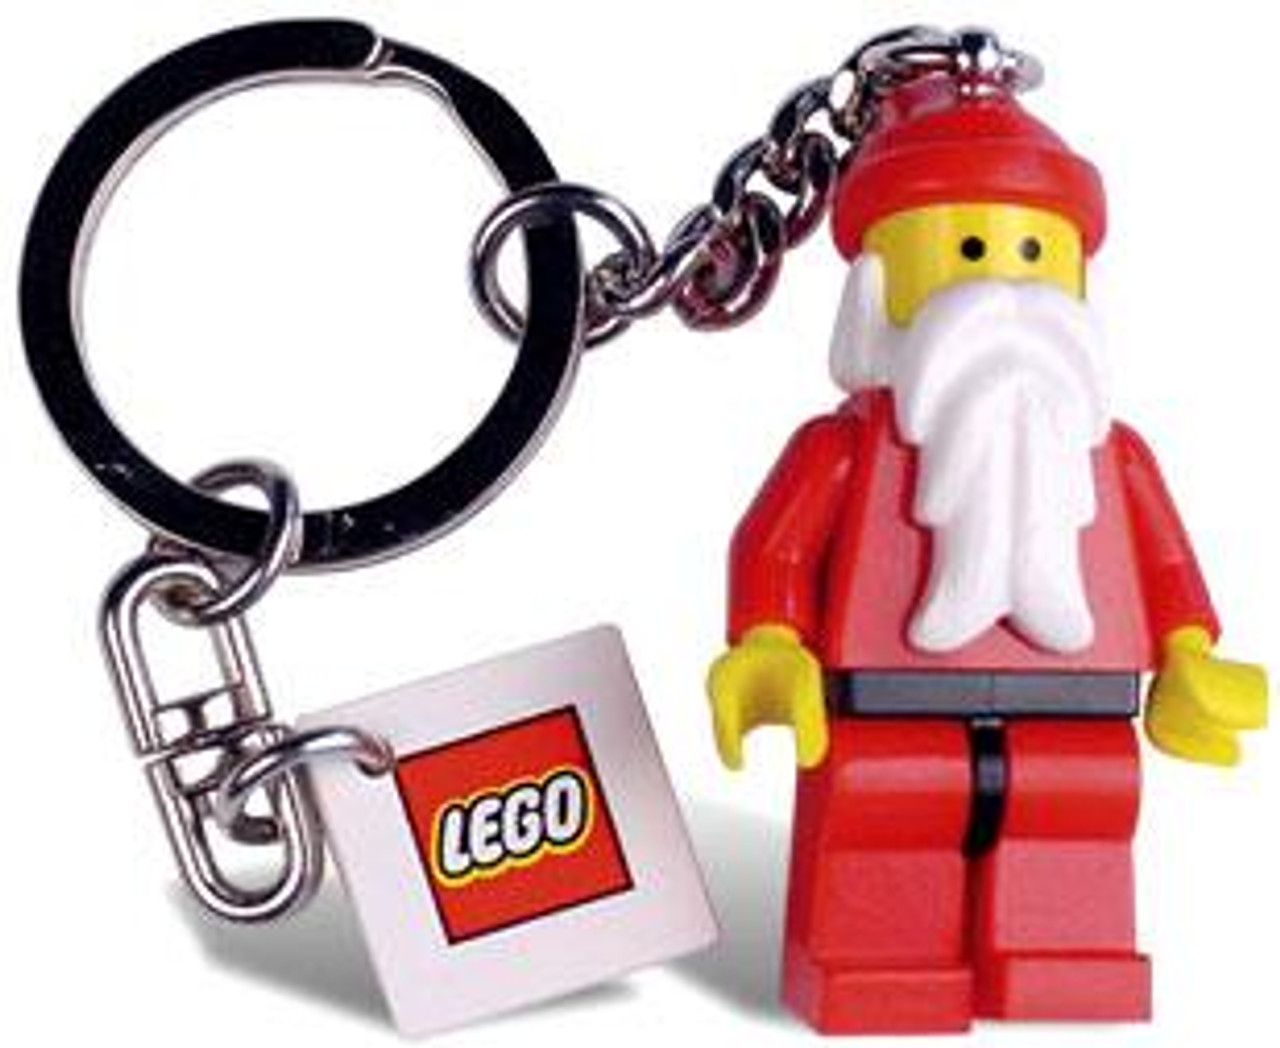 LEGO Santa Minifigure Keychain #850150